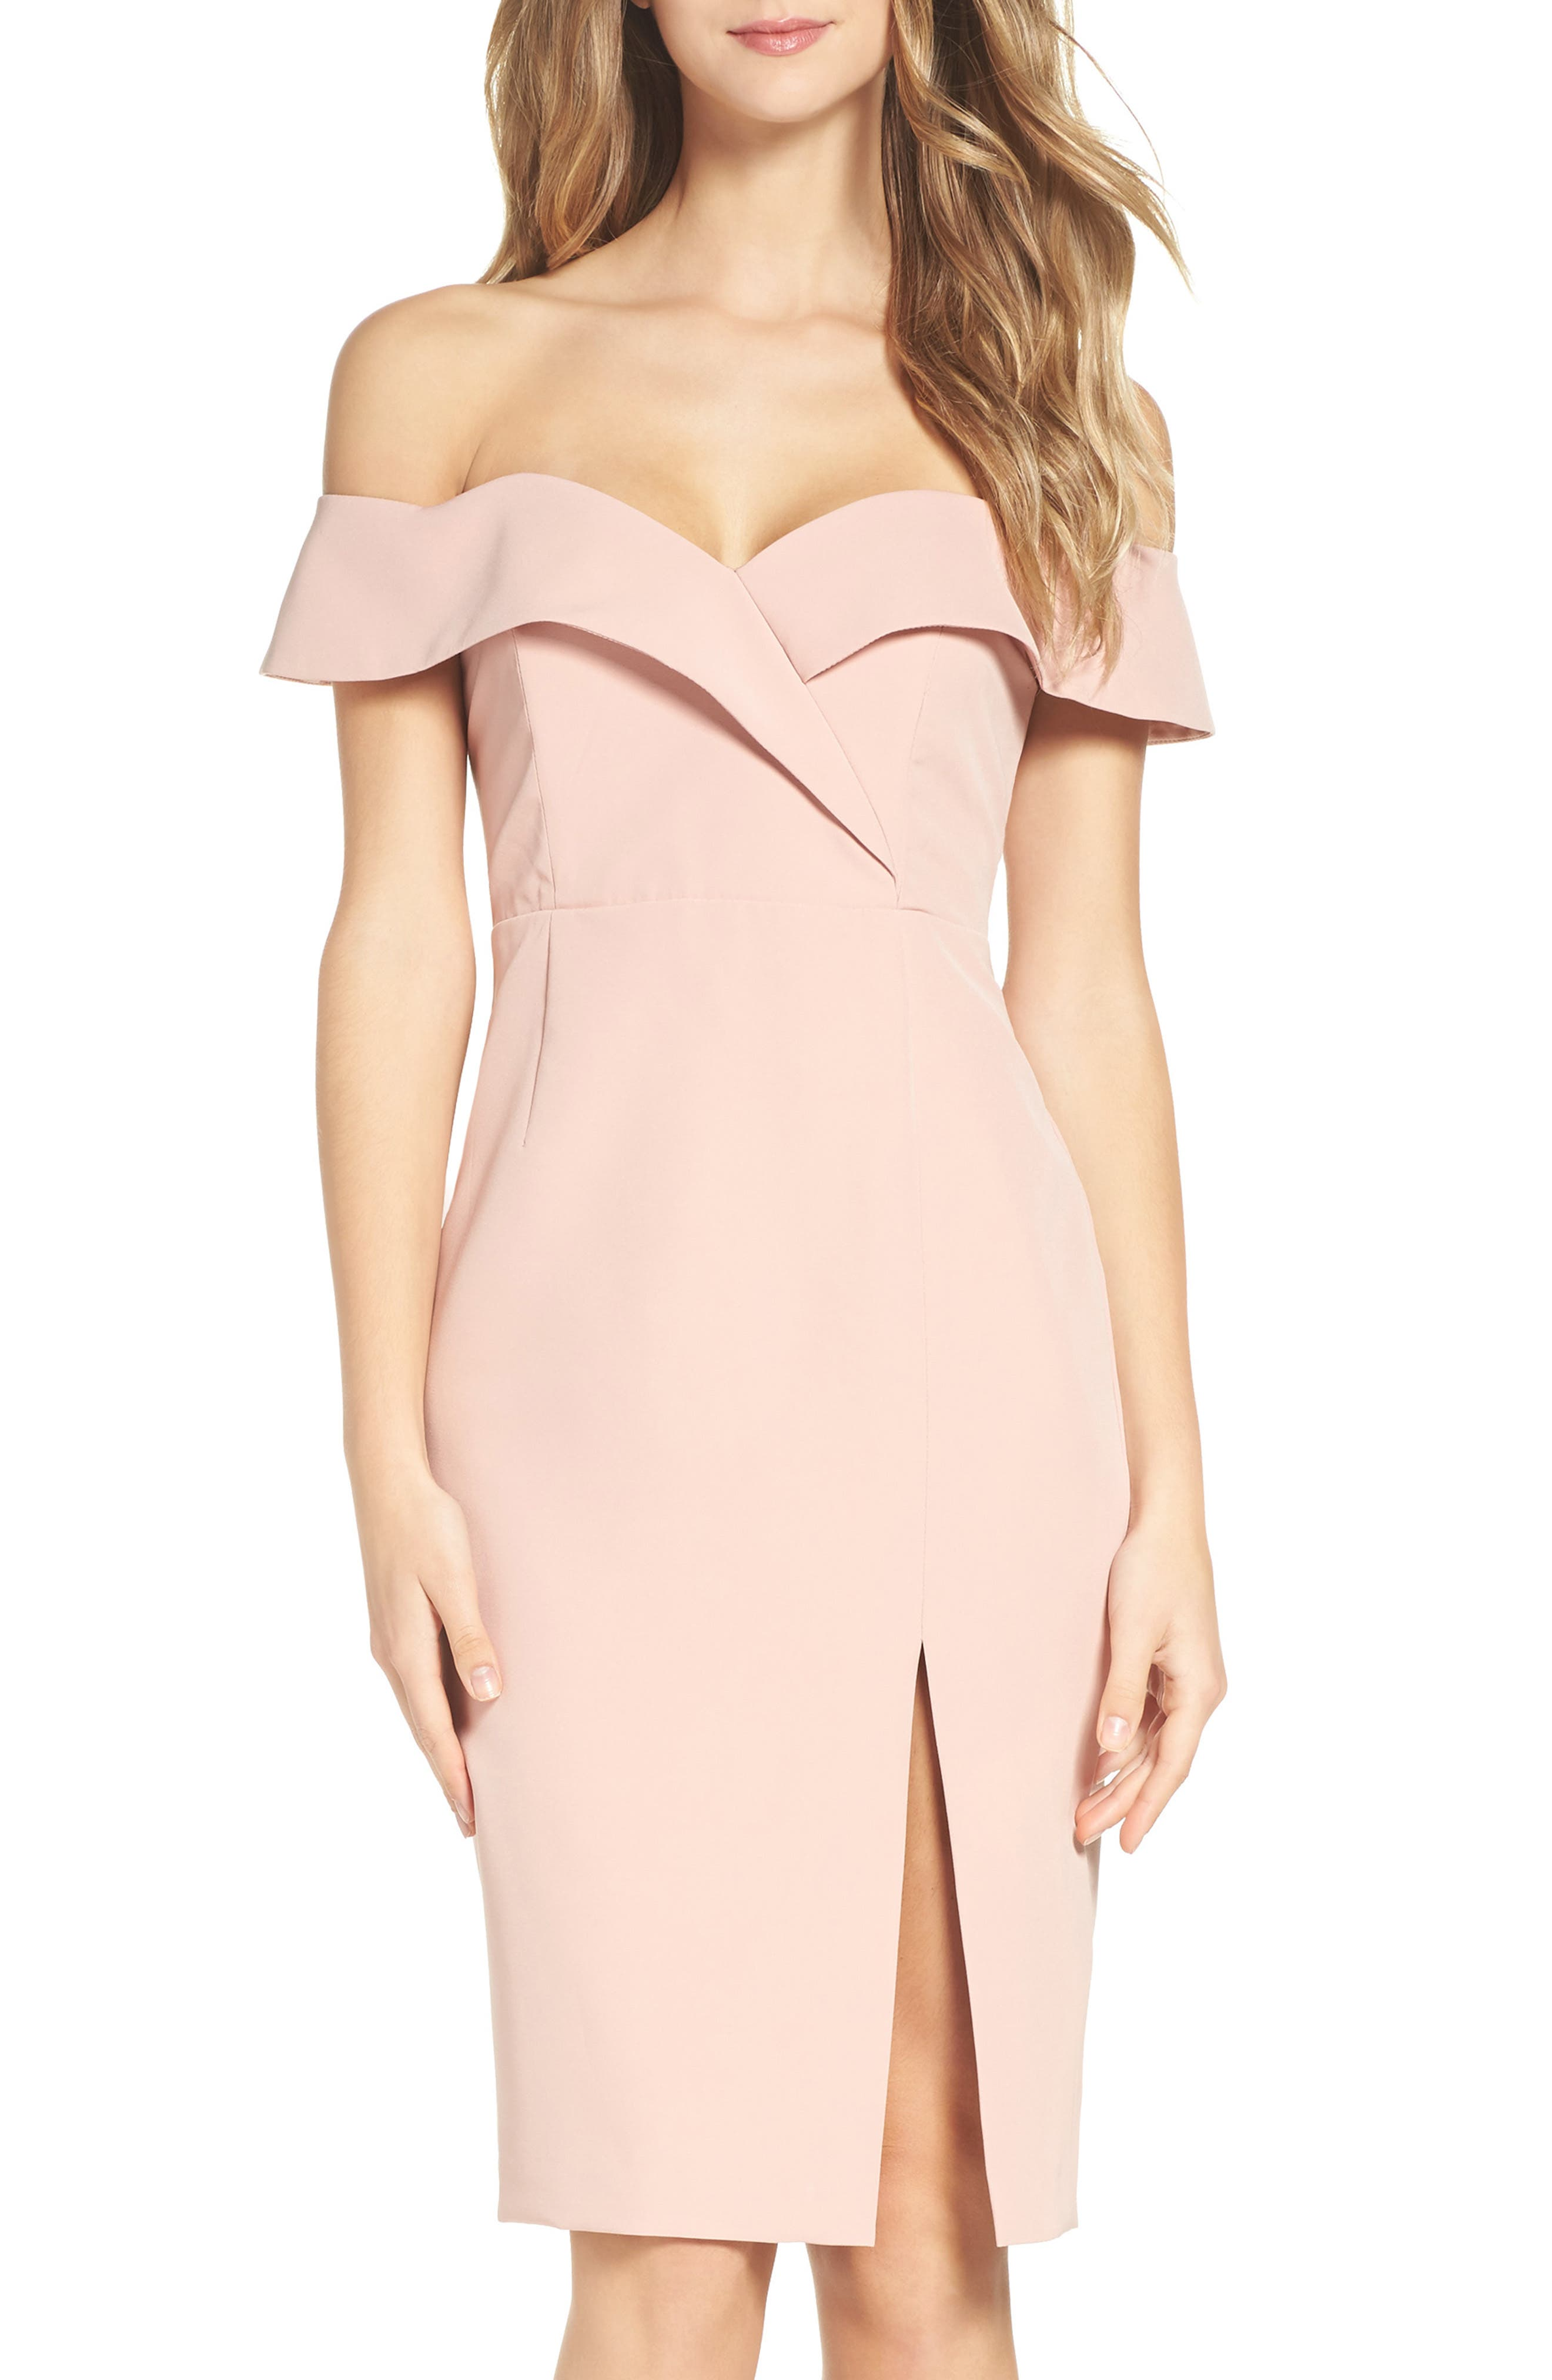 Bella Midi Dress,                             Main thumbnail 1, color,                             250